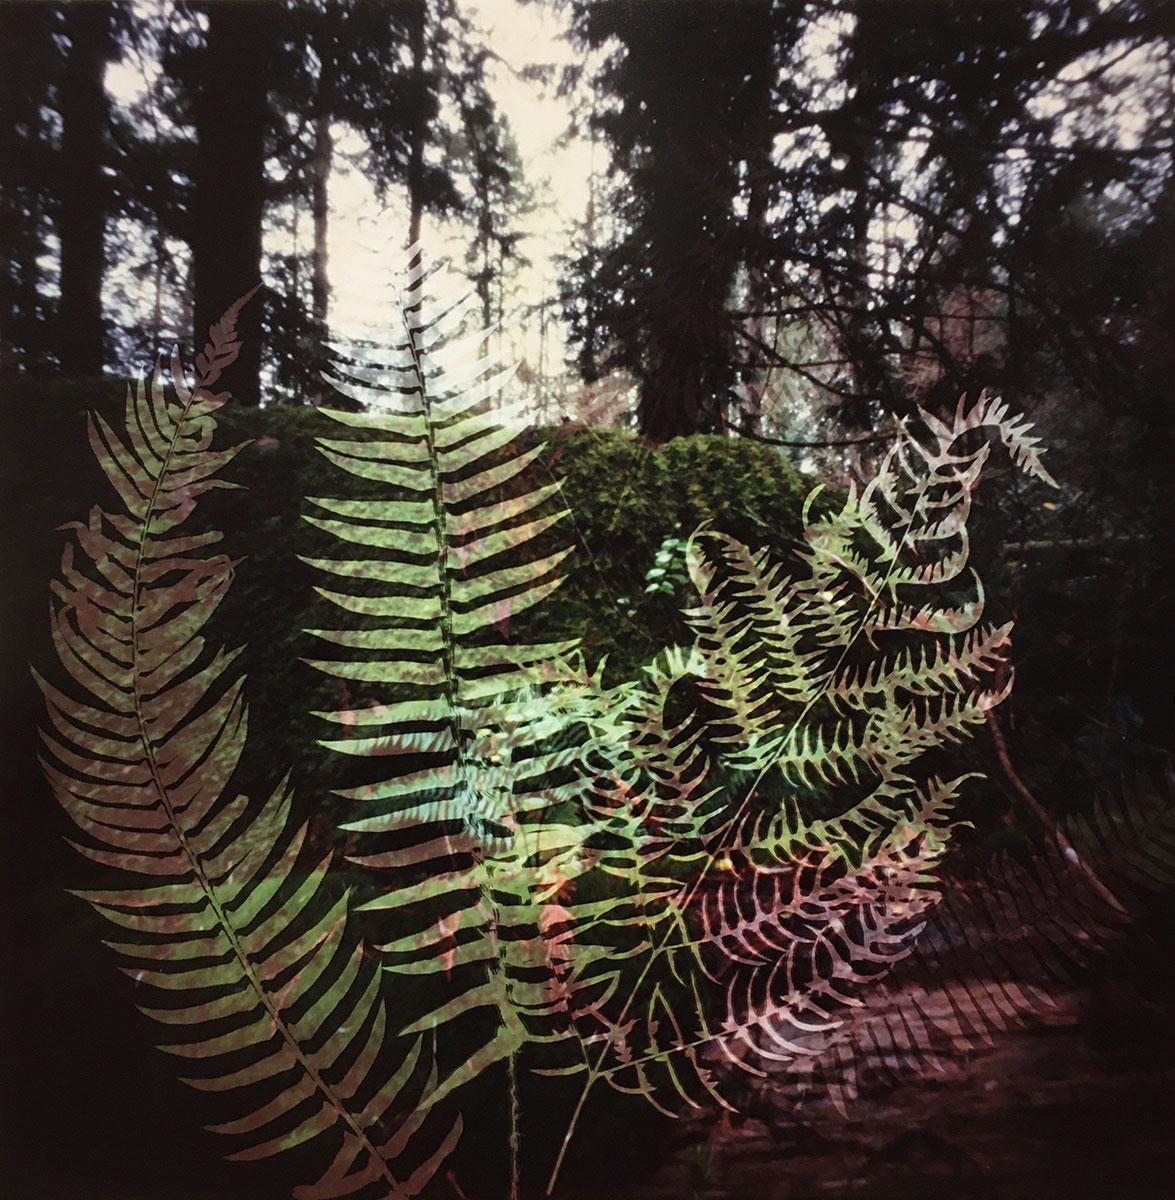 Understory 9.1, Bowen Island, British Columbia (2020)